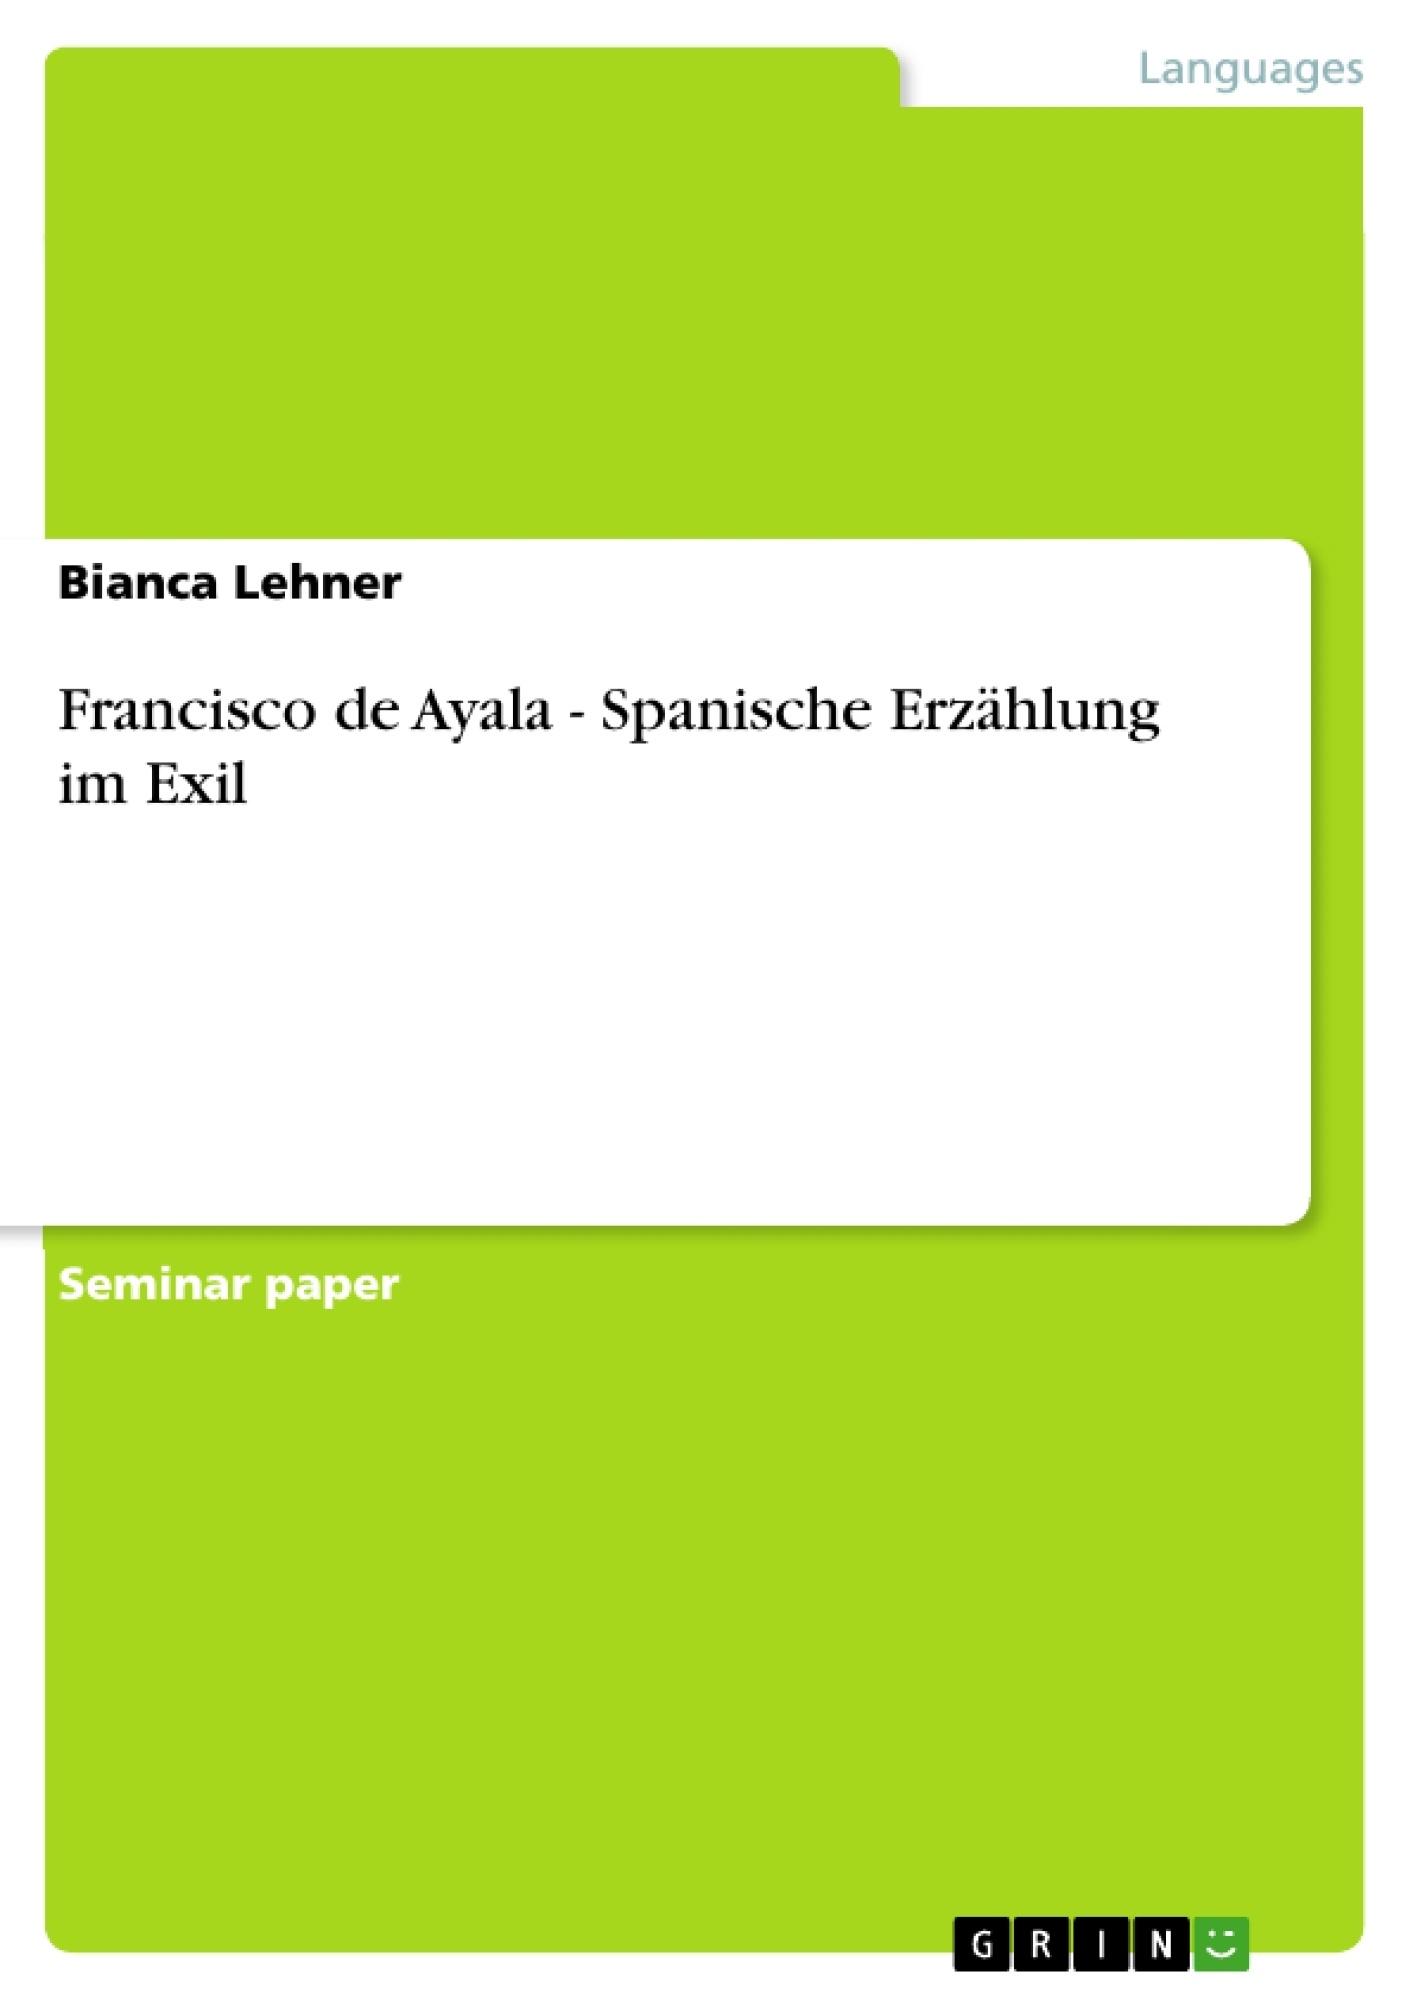 Título: Francisco de Ayala - Spanische Erzählung im Exil